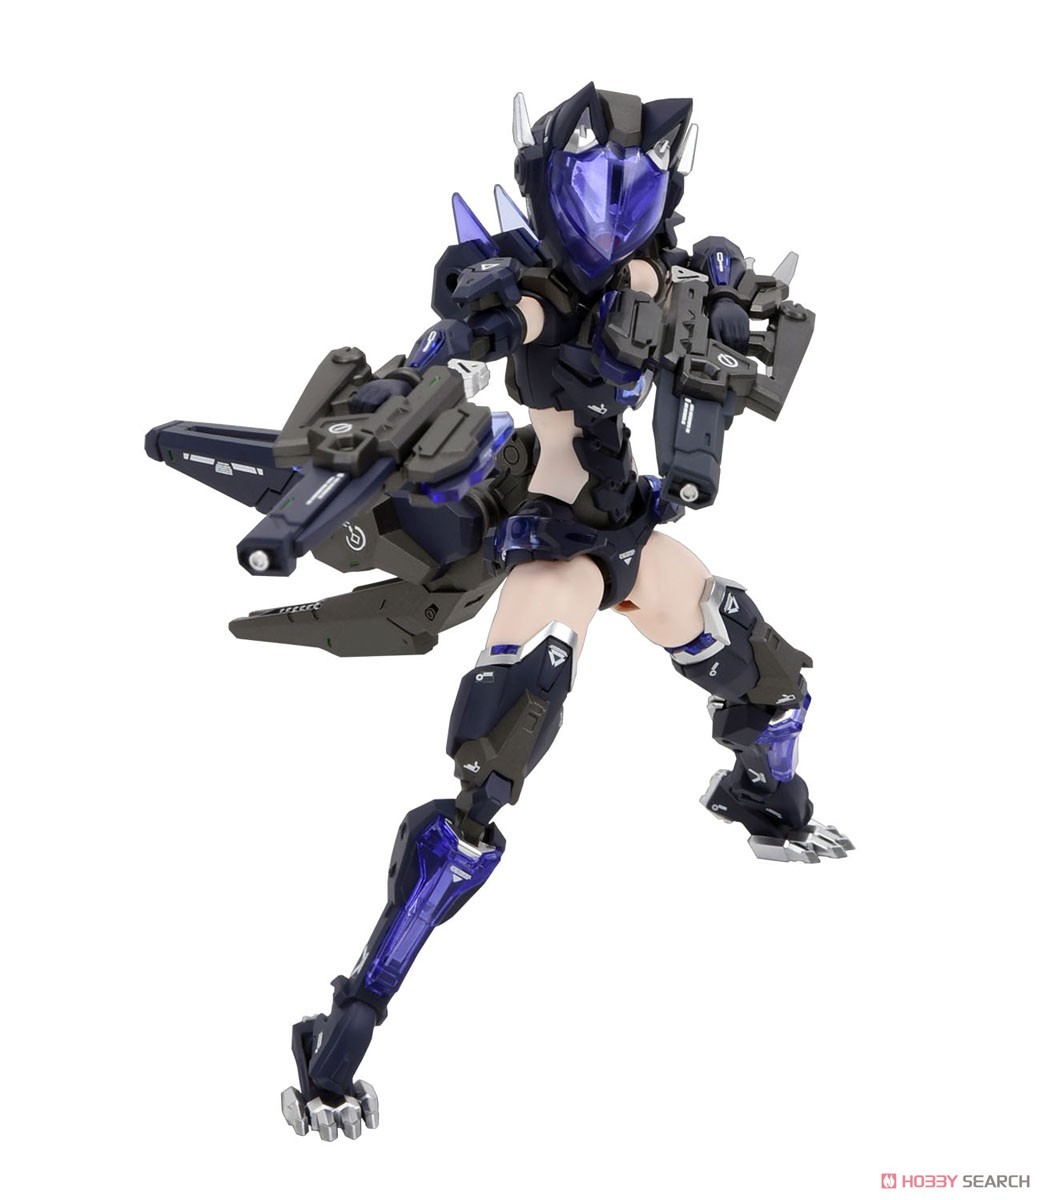 CYBER FOREST[FANTASY GIRLS]『F.O.X Long Range Striker Unit【通常版】』1/12 プラモデル-005